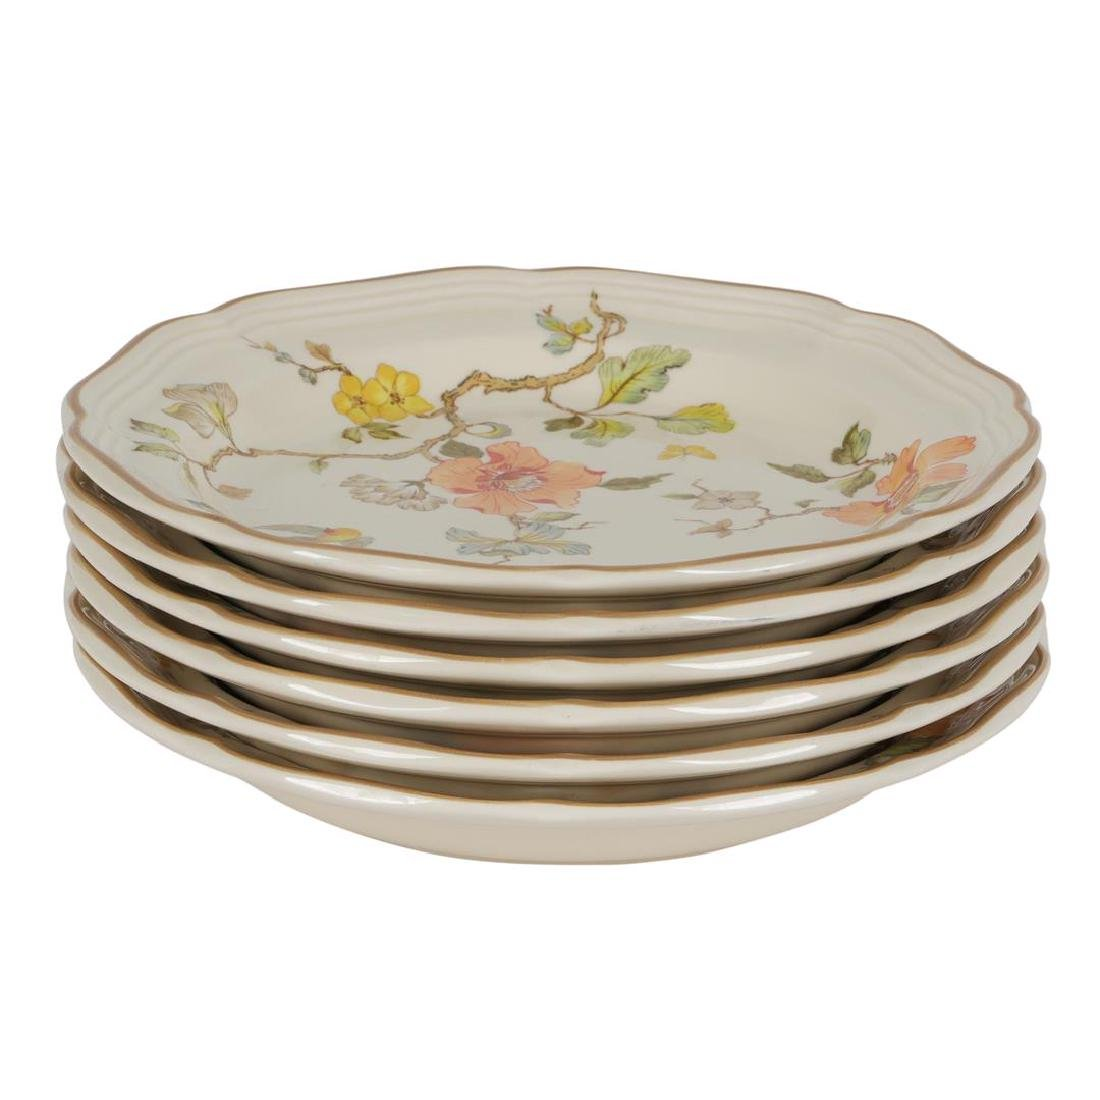 "Mikasa China Heritage ""Olde Tapestry"" 8"" Salad Plates -"